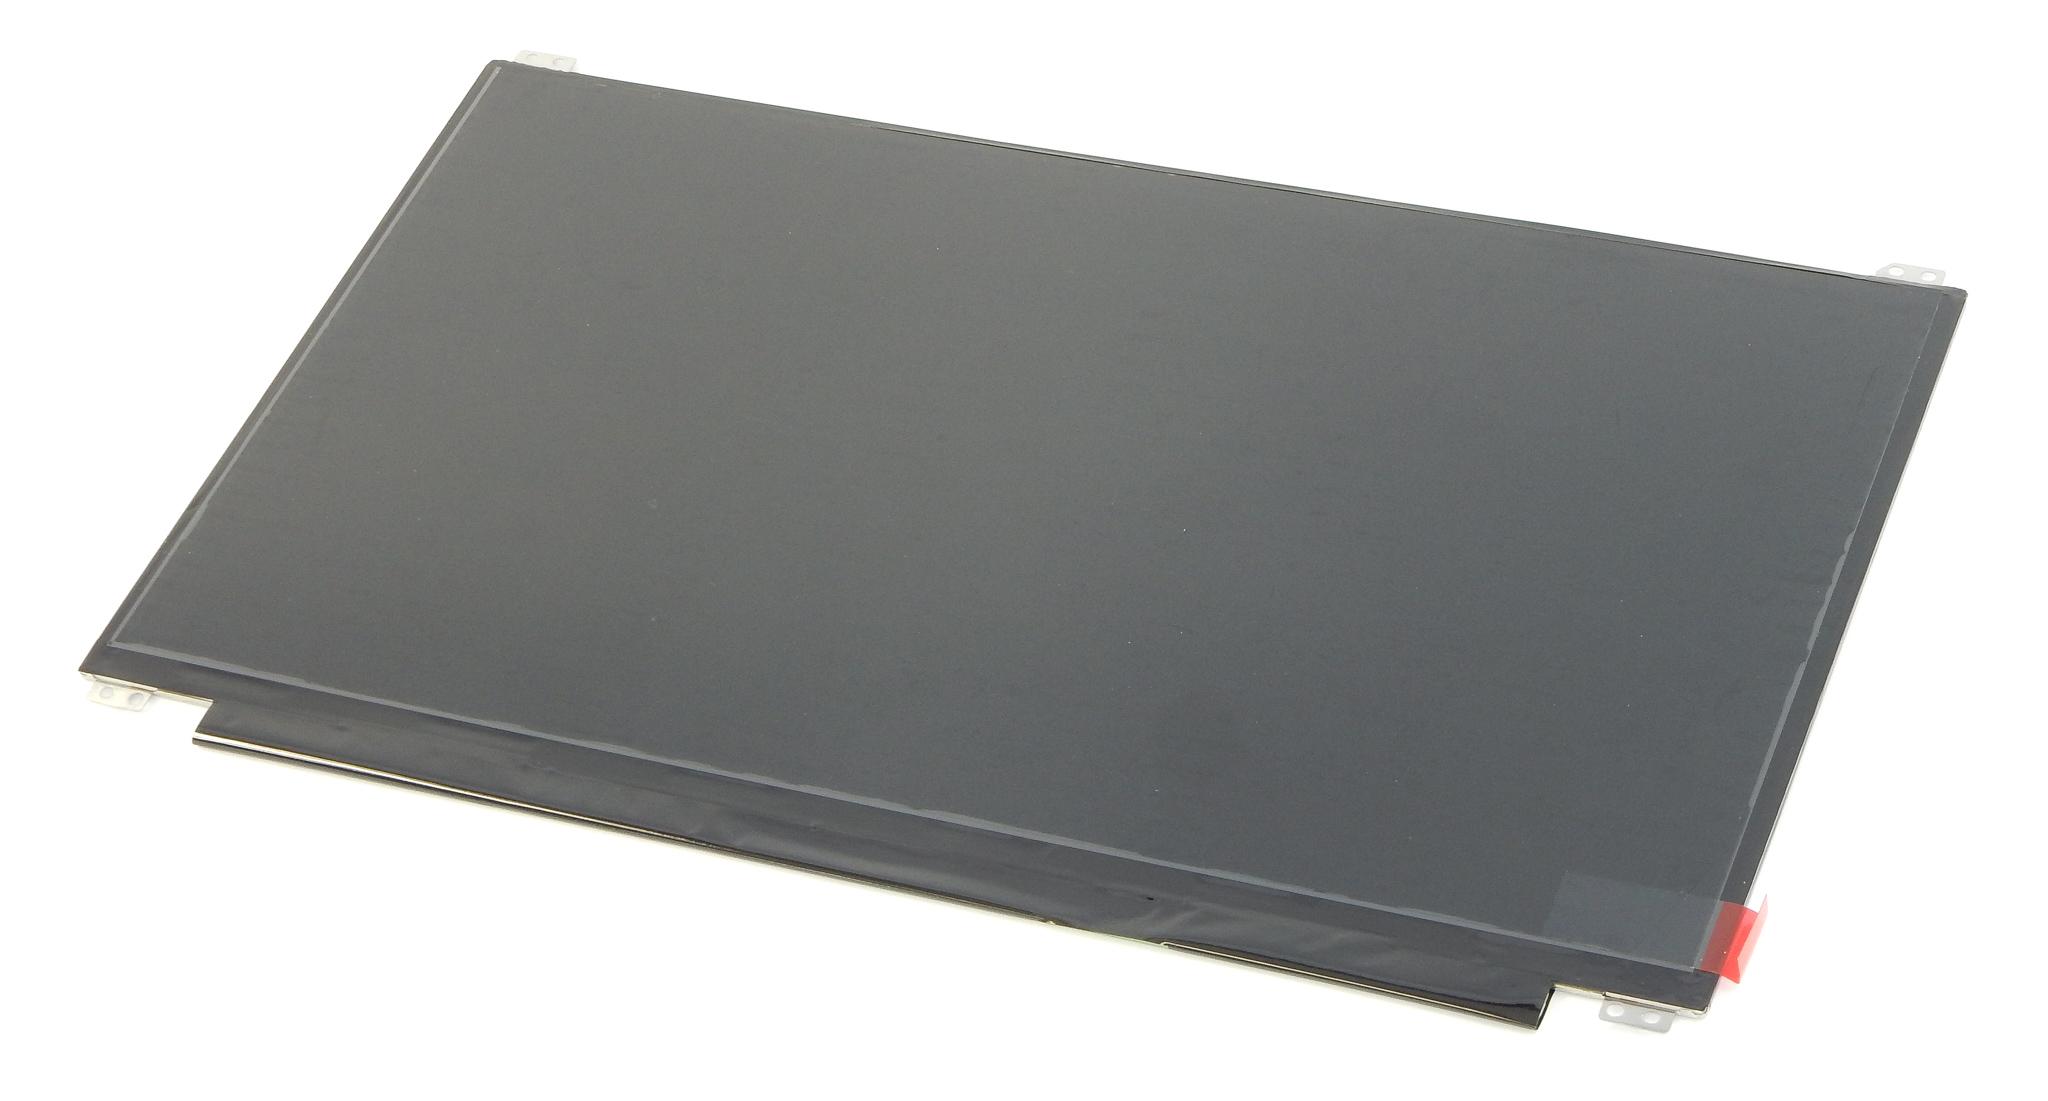 "AUO B133HAN02.7 13.3"" FHD 30Pin Glossy Slim LED Panel"